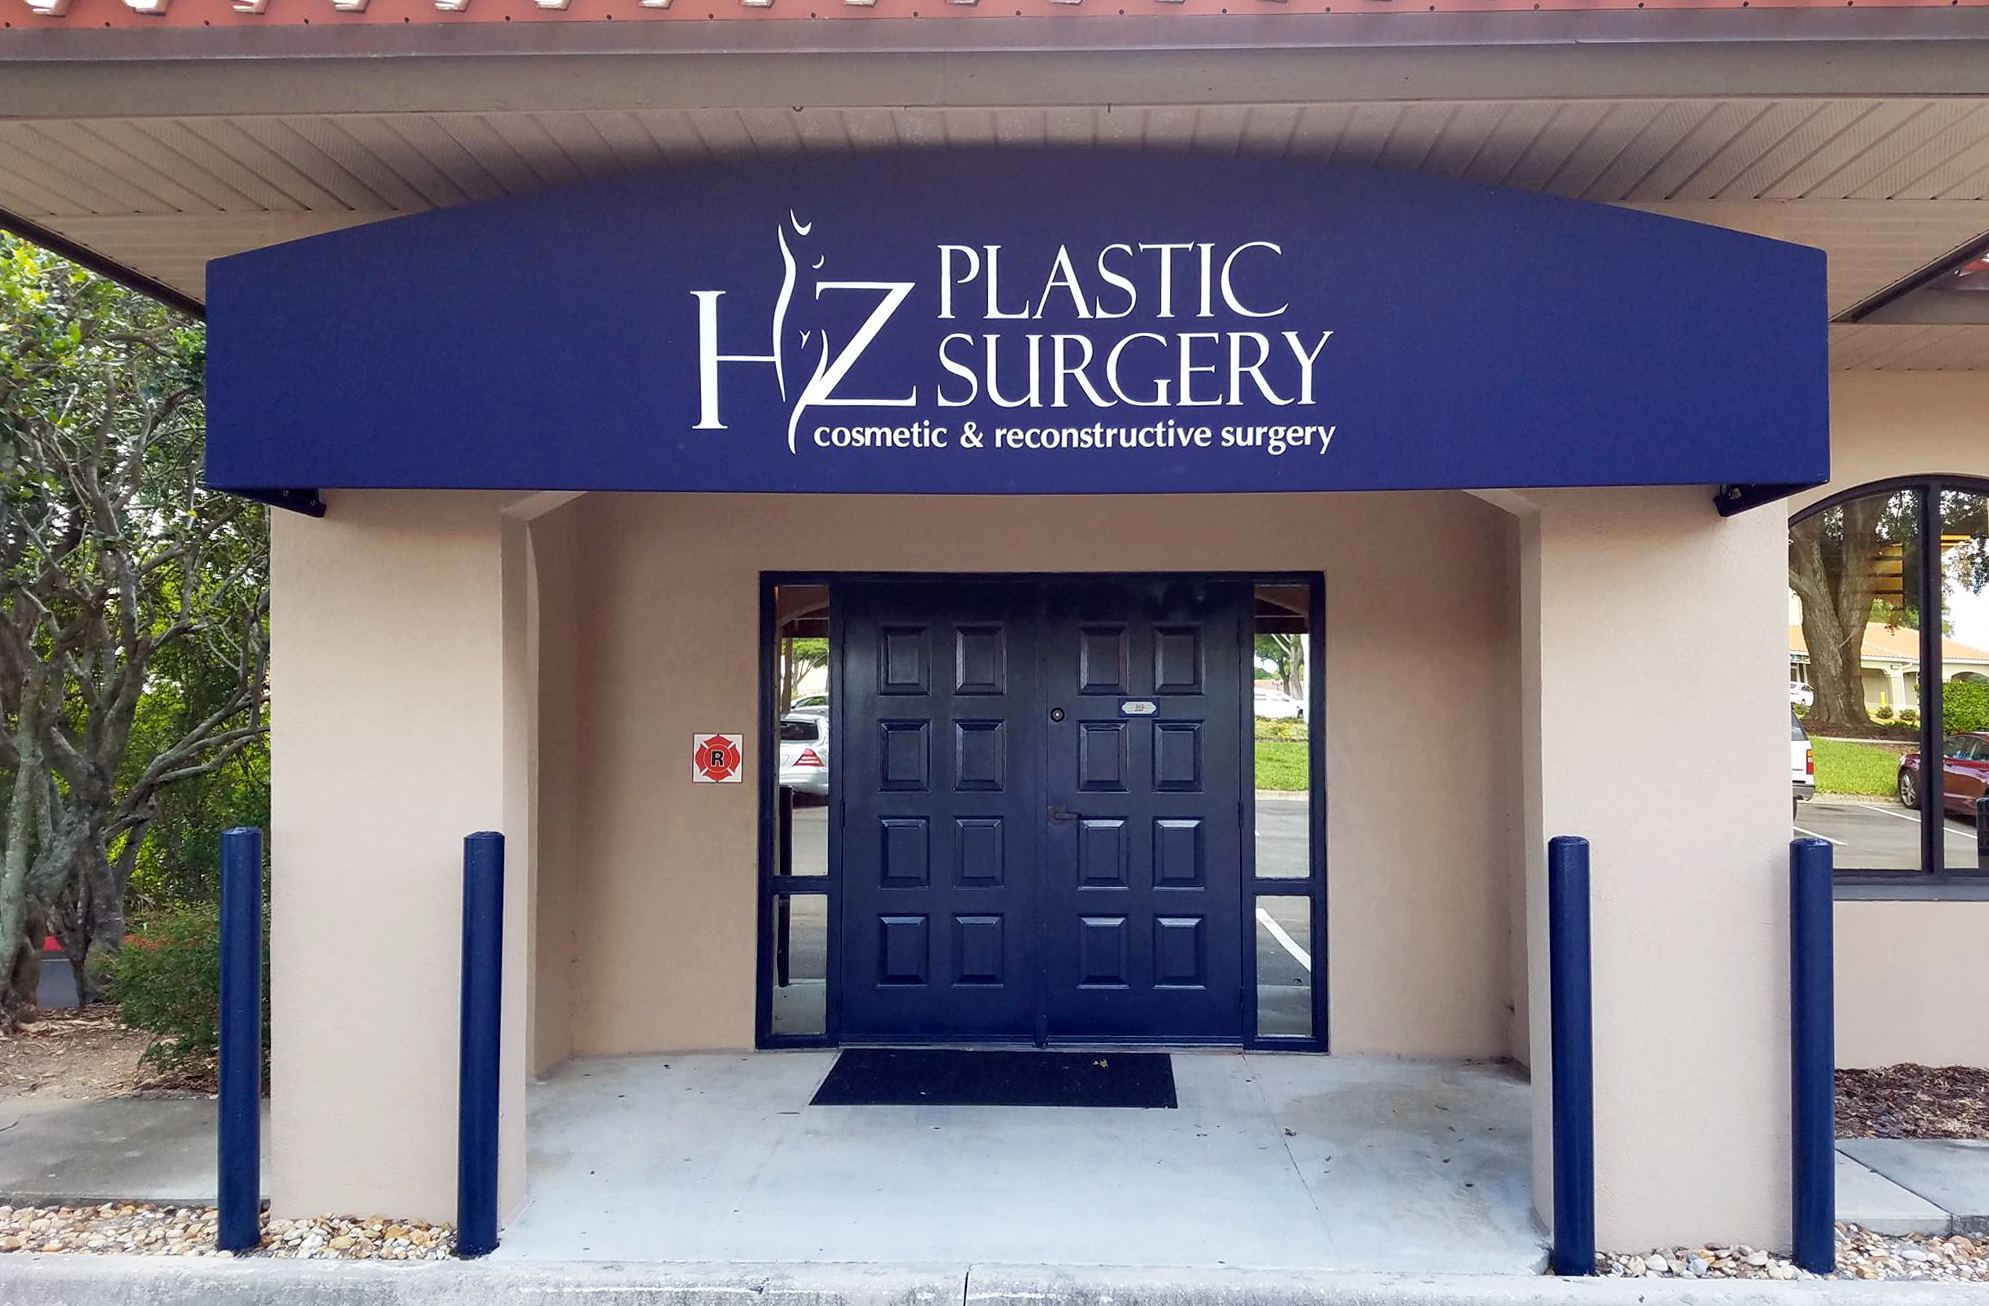 plastic surgery orlando, plastic surgeon orlando, hz plastic surgery, plastic surgeon near me